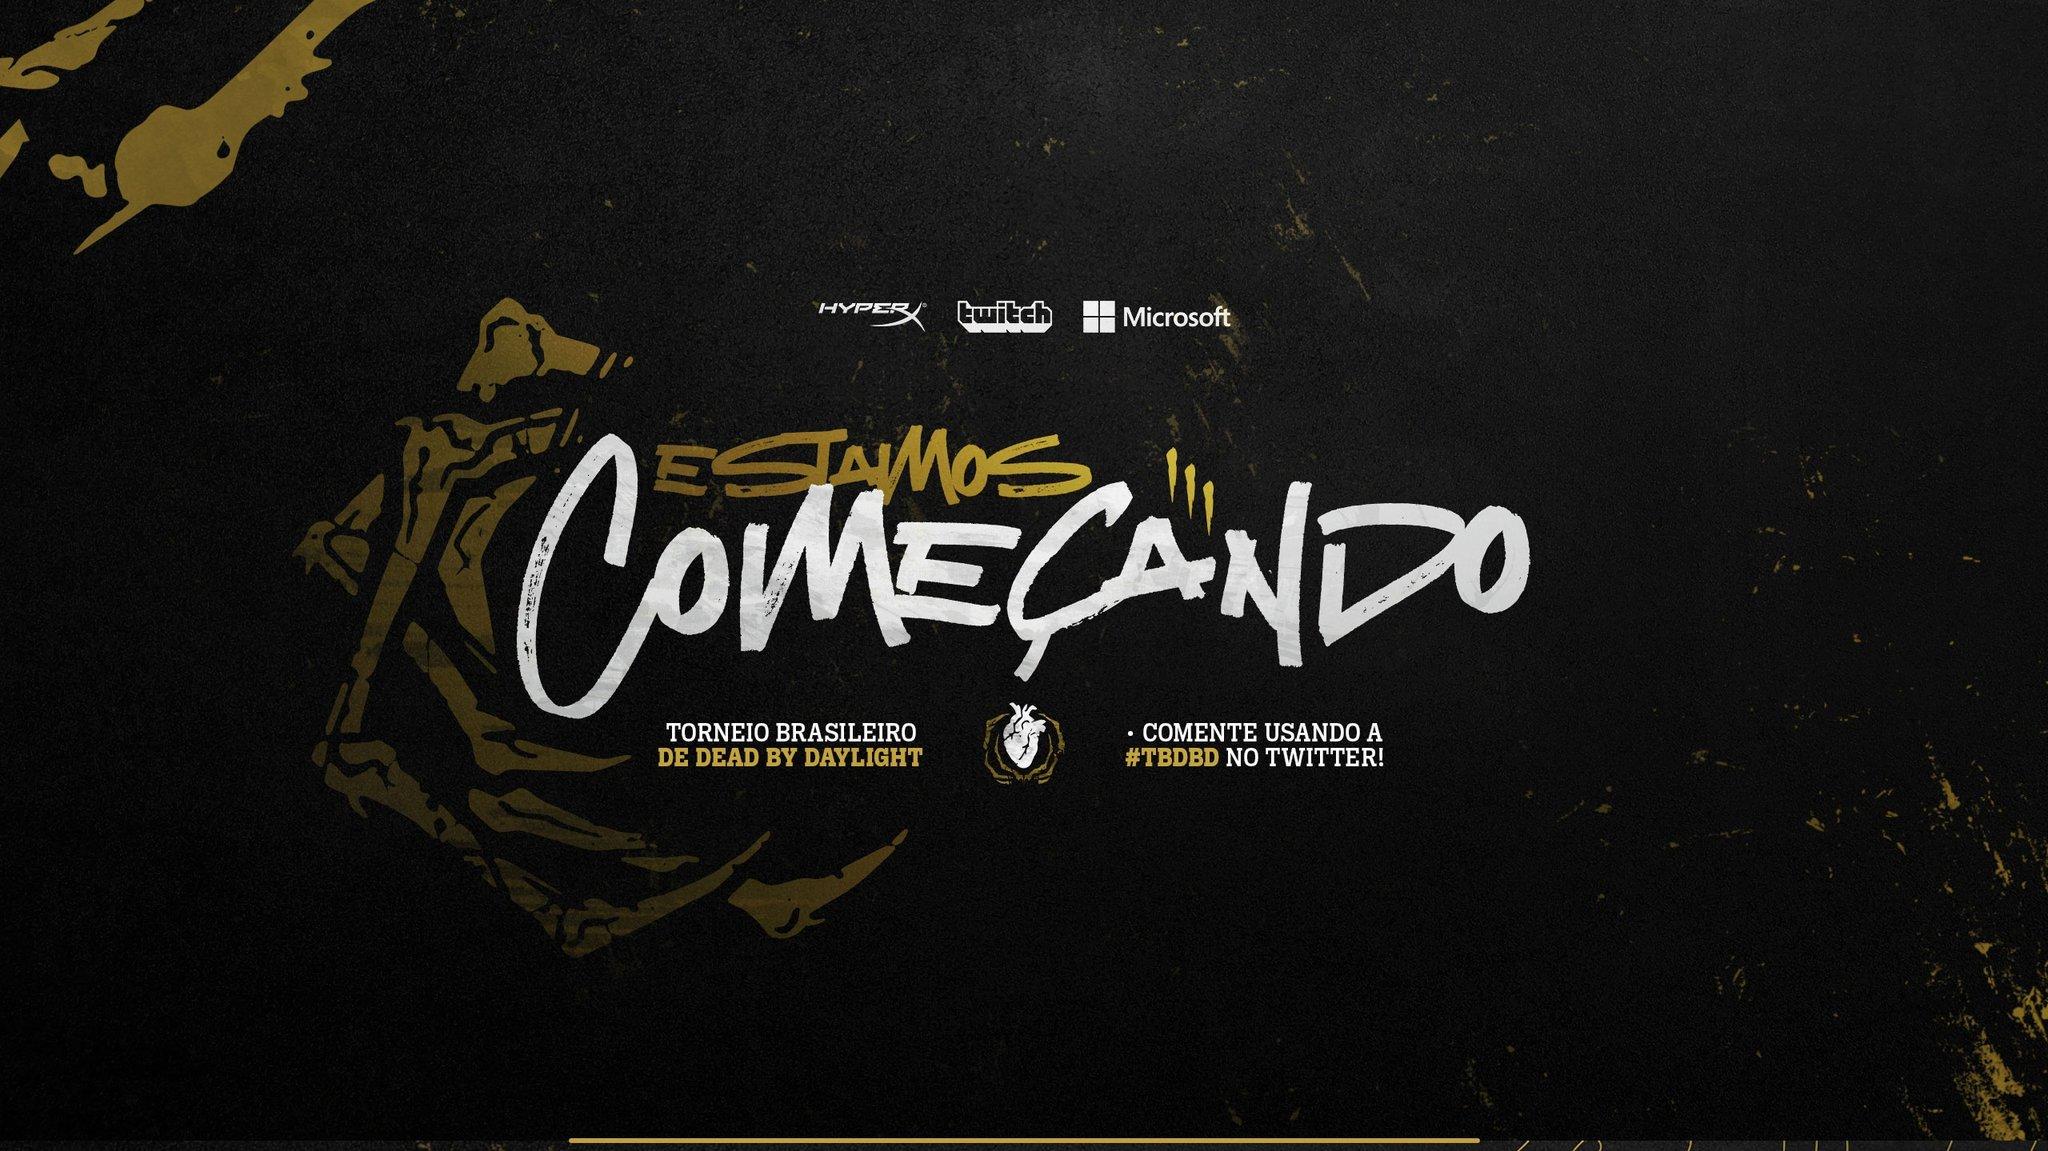 O Torneio Brasileiro de Dead by Daylight -  #TBDBD